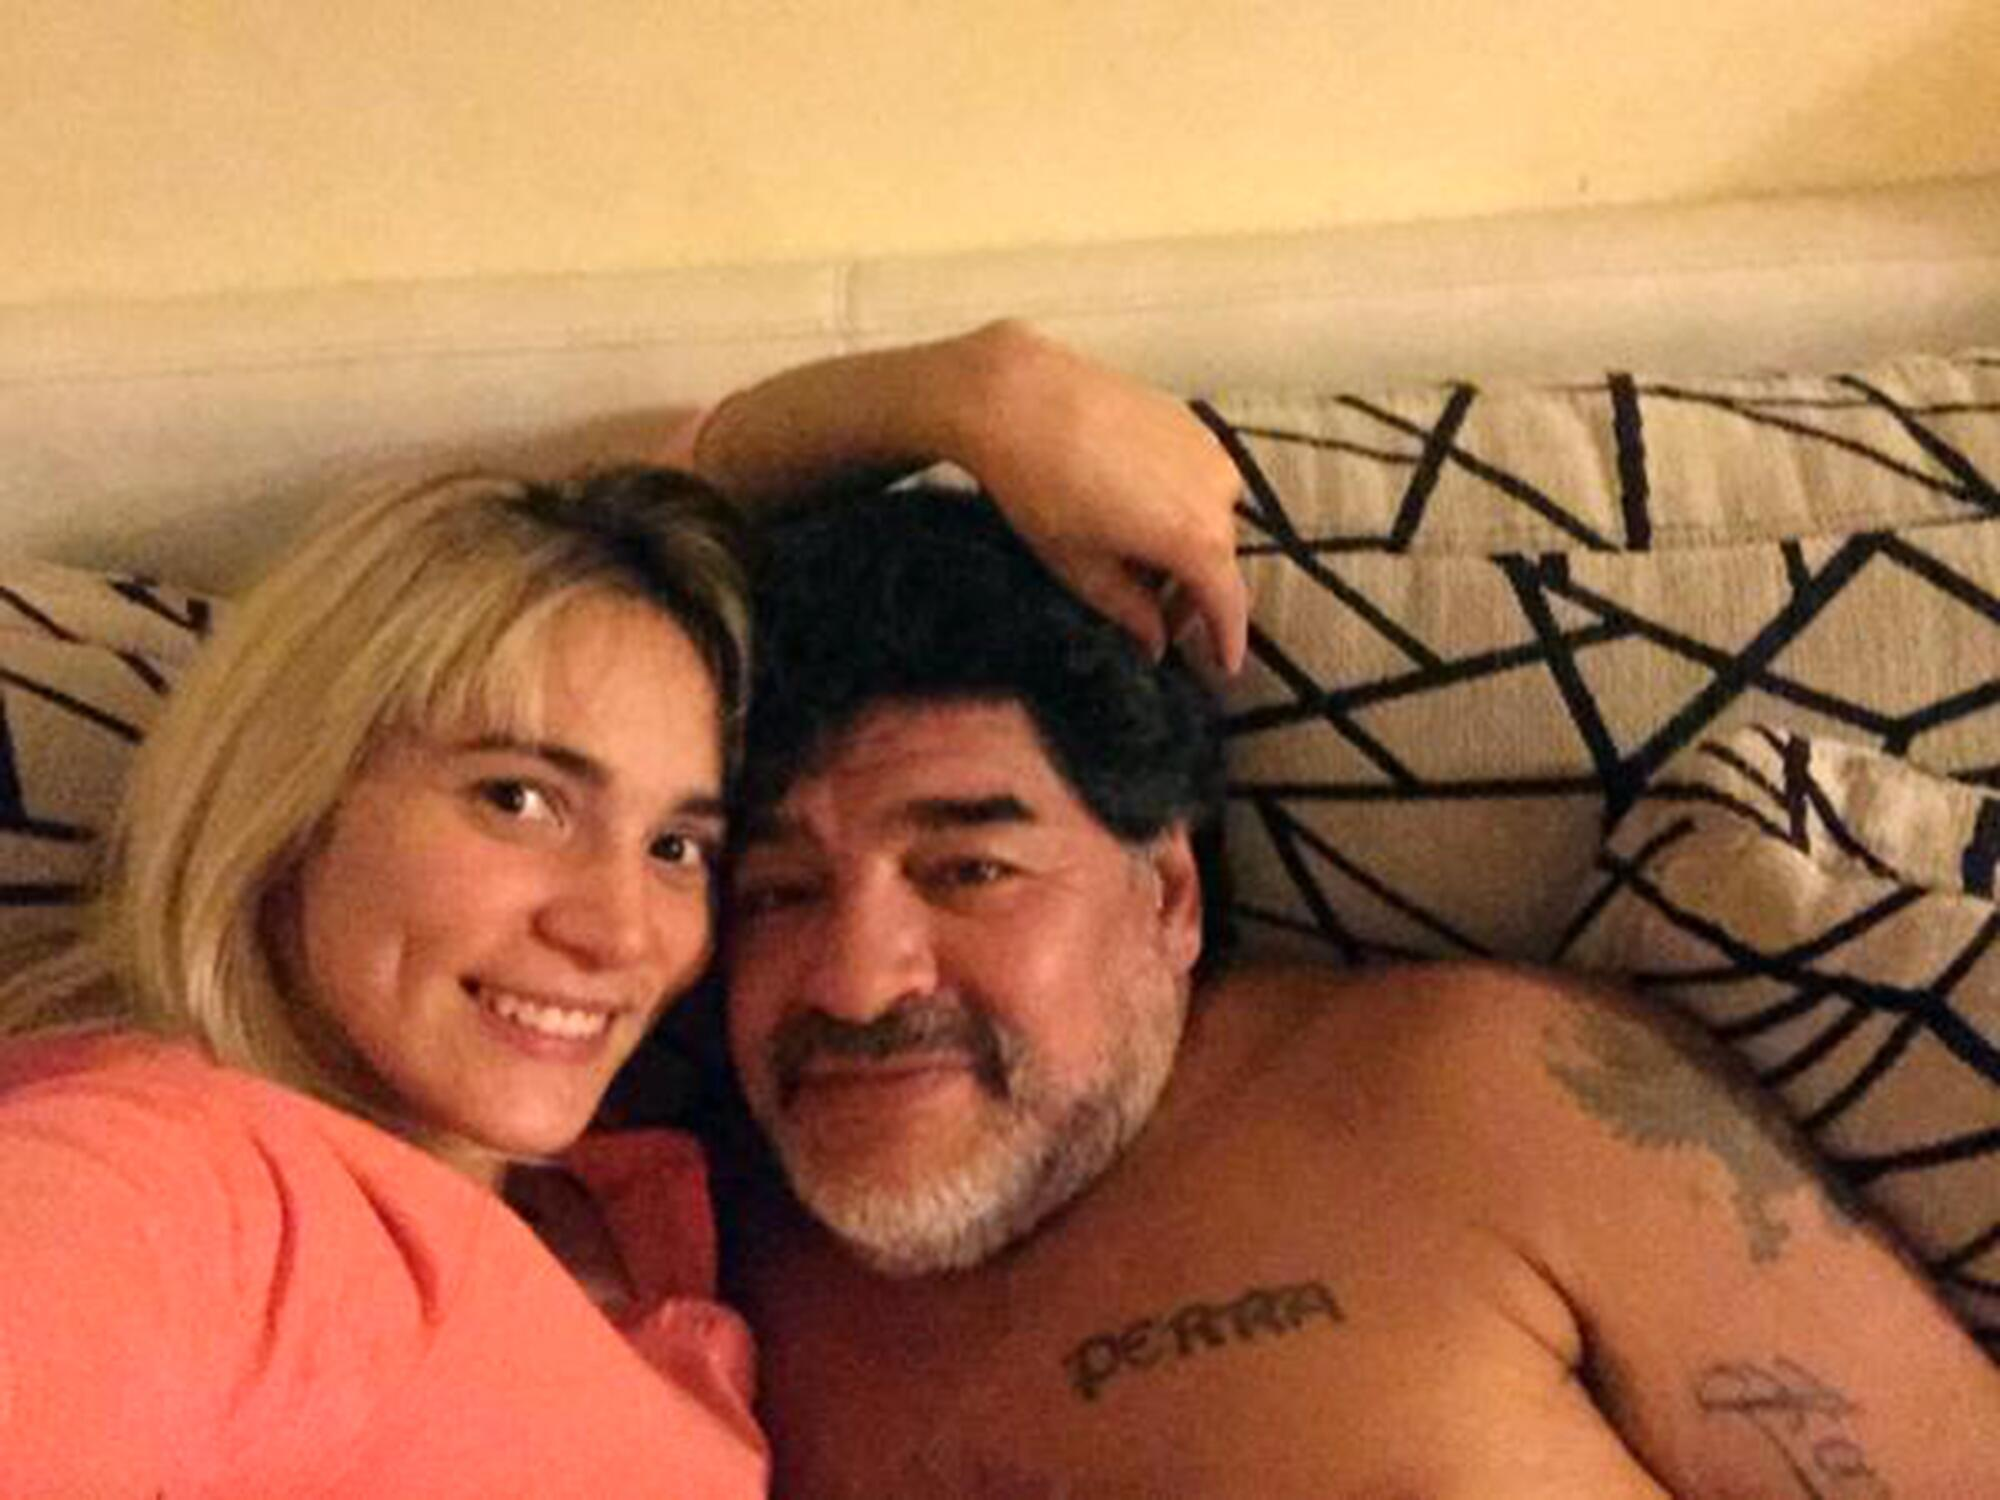 Bild zu Diego Maradona, Rocio Oliva, Paar, Bett, Couch, Kuscheln